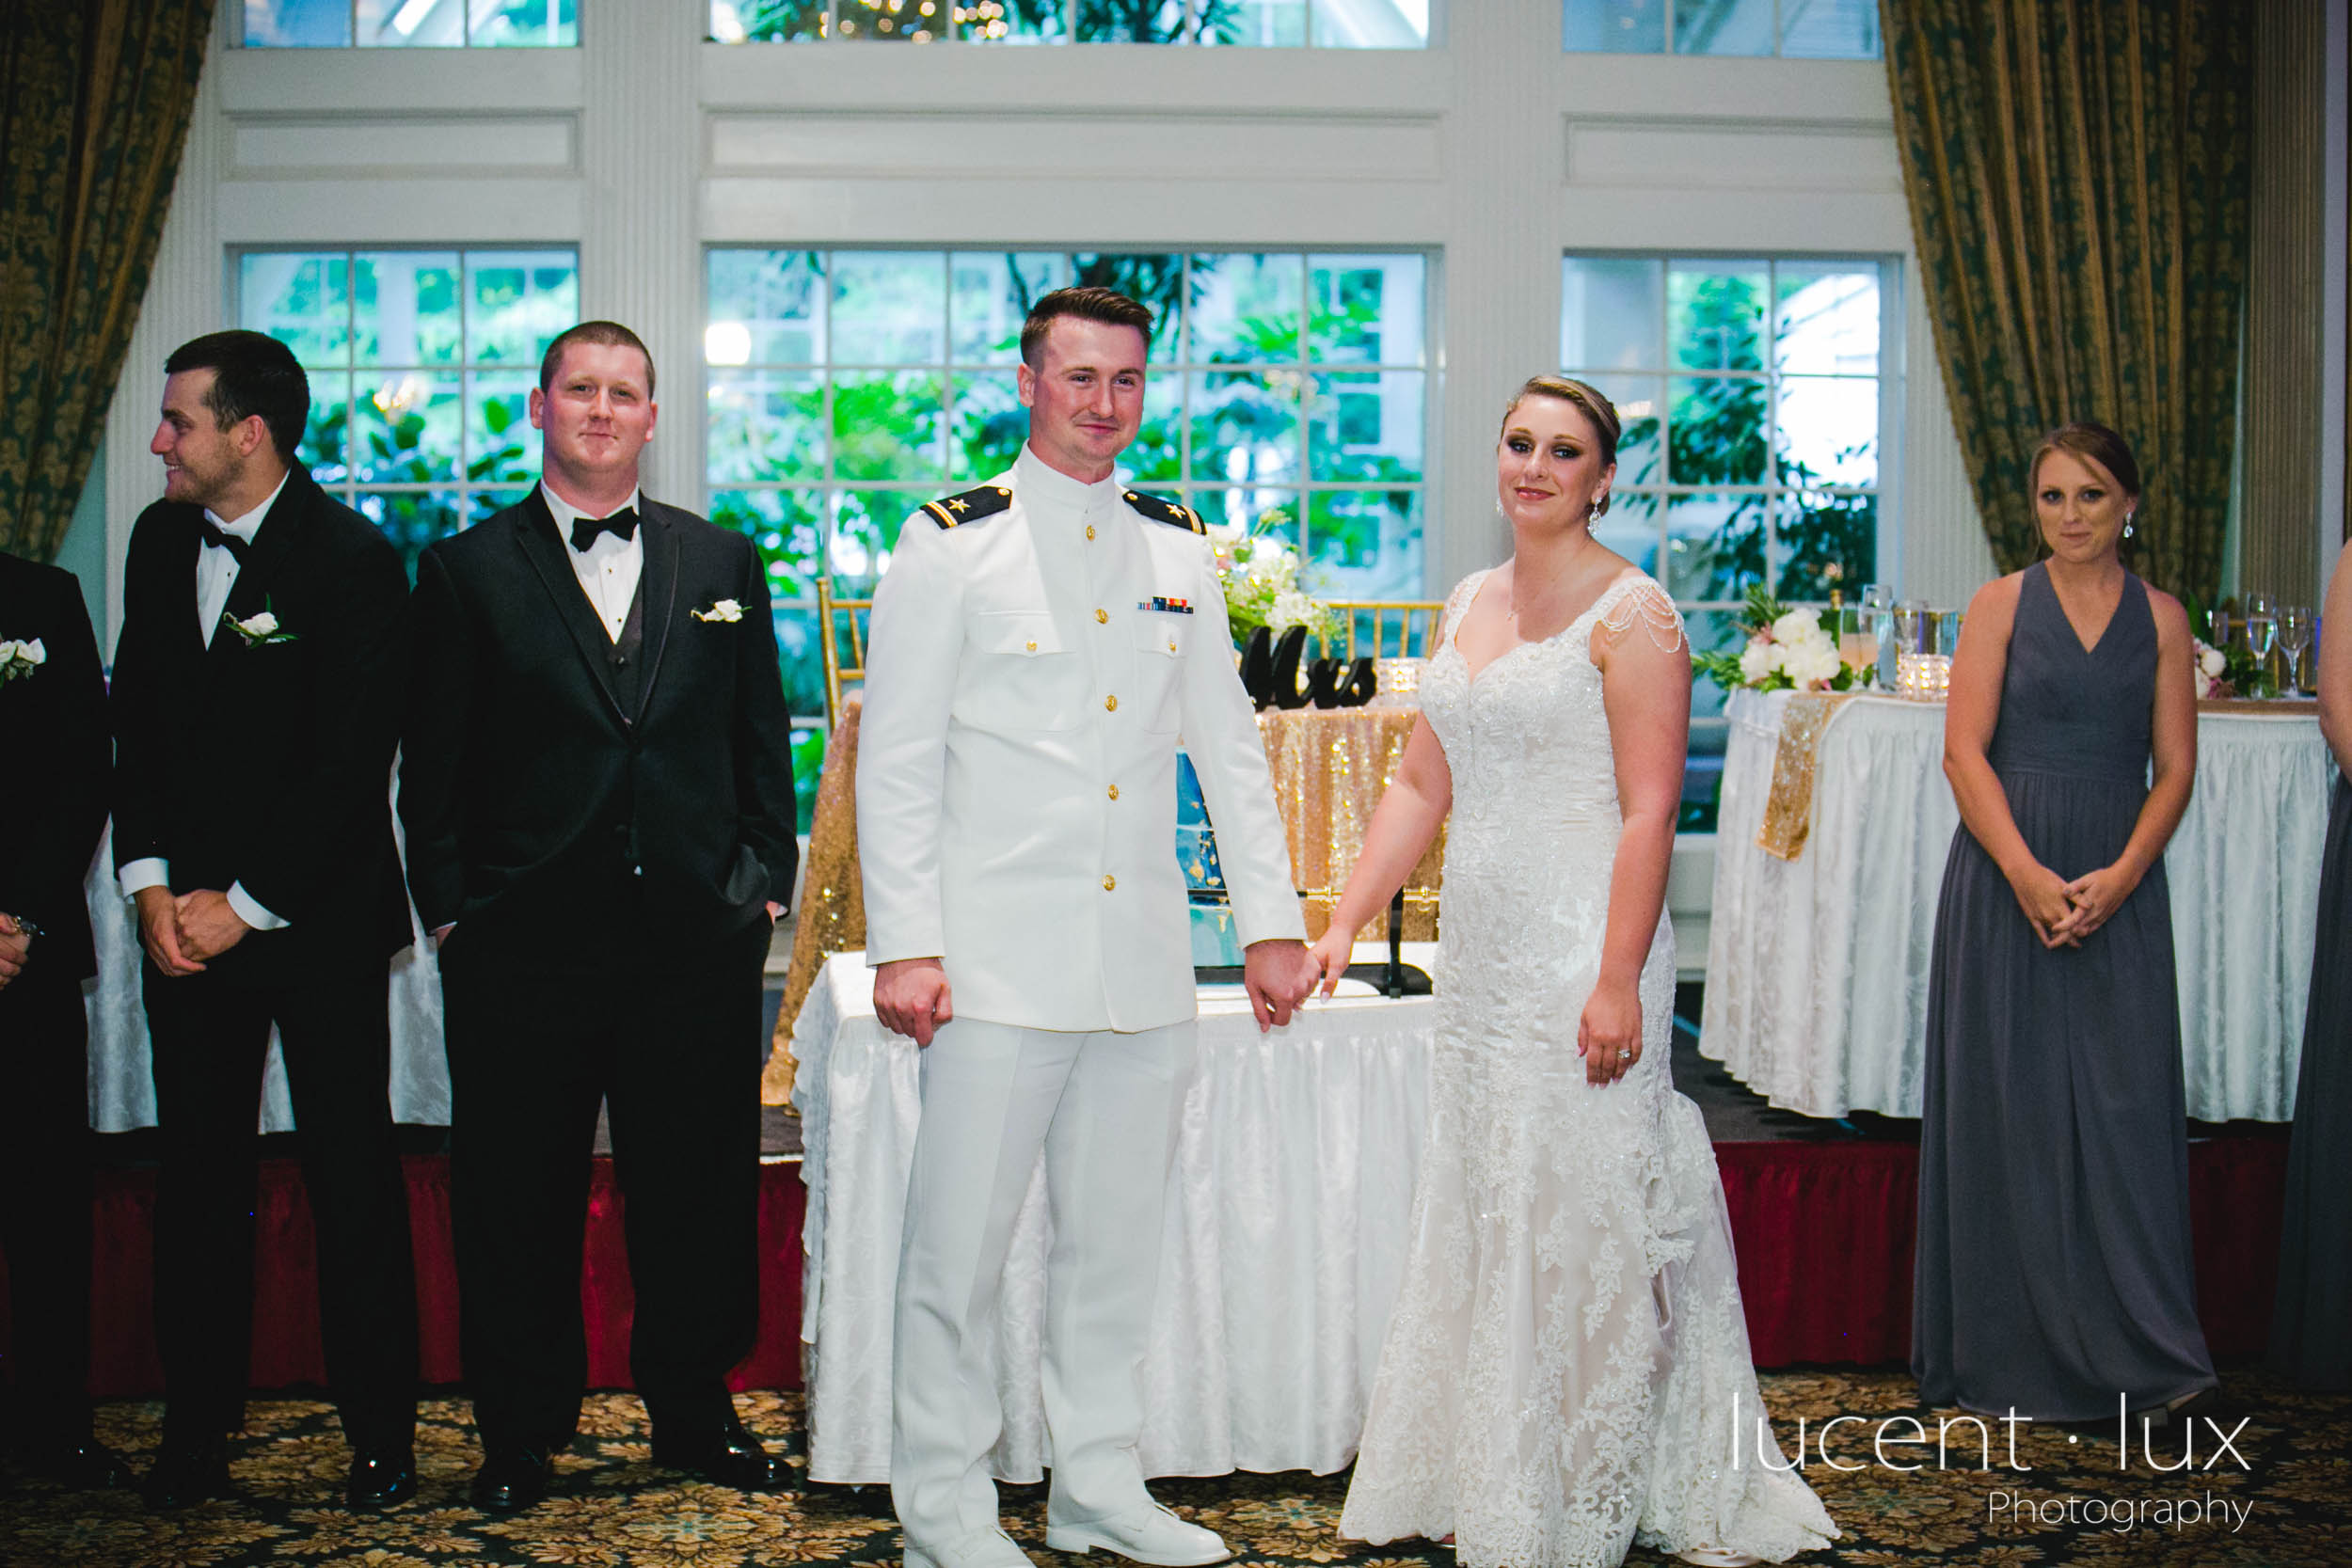 Wedding-Photography-Maryland-Pennsylvania-Photographer-Mendenhall-Inn-Media-Portrait-Event-147.jpg